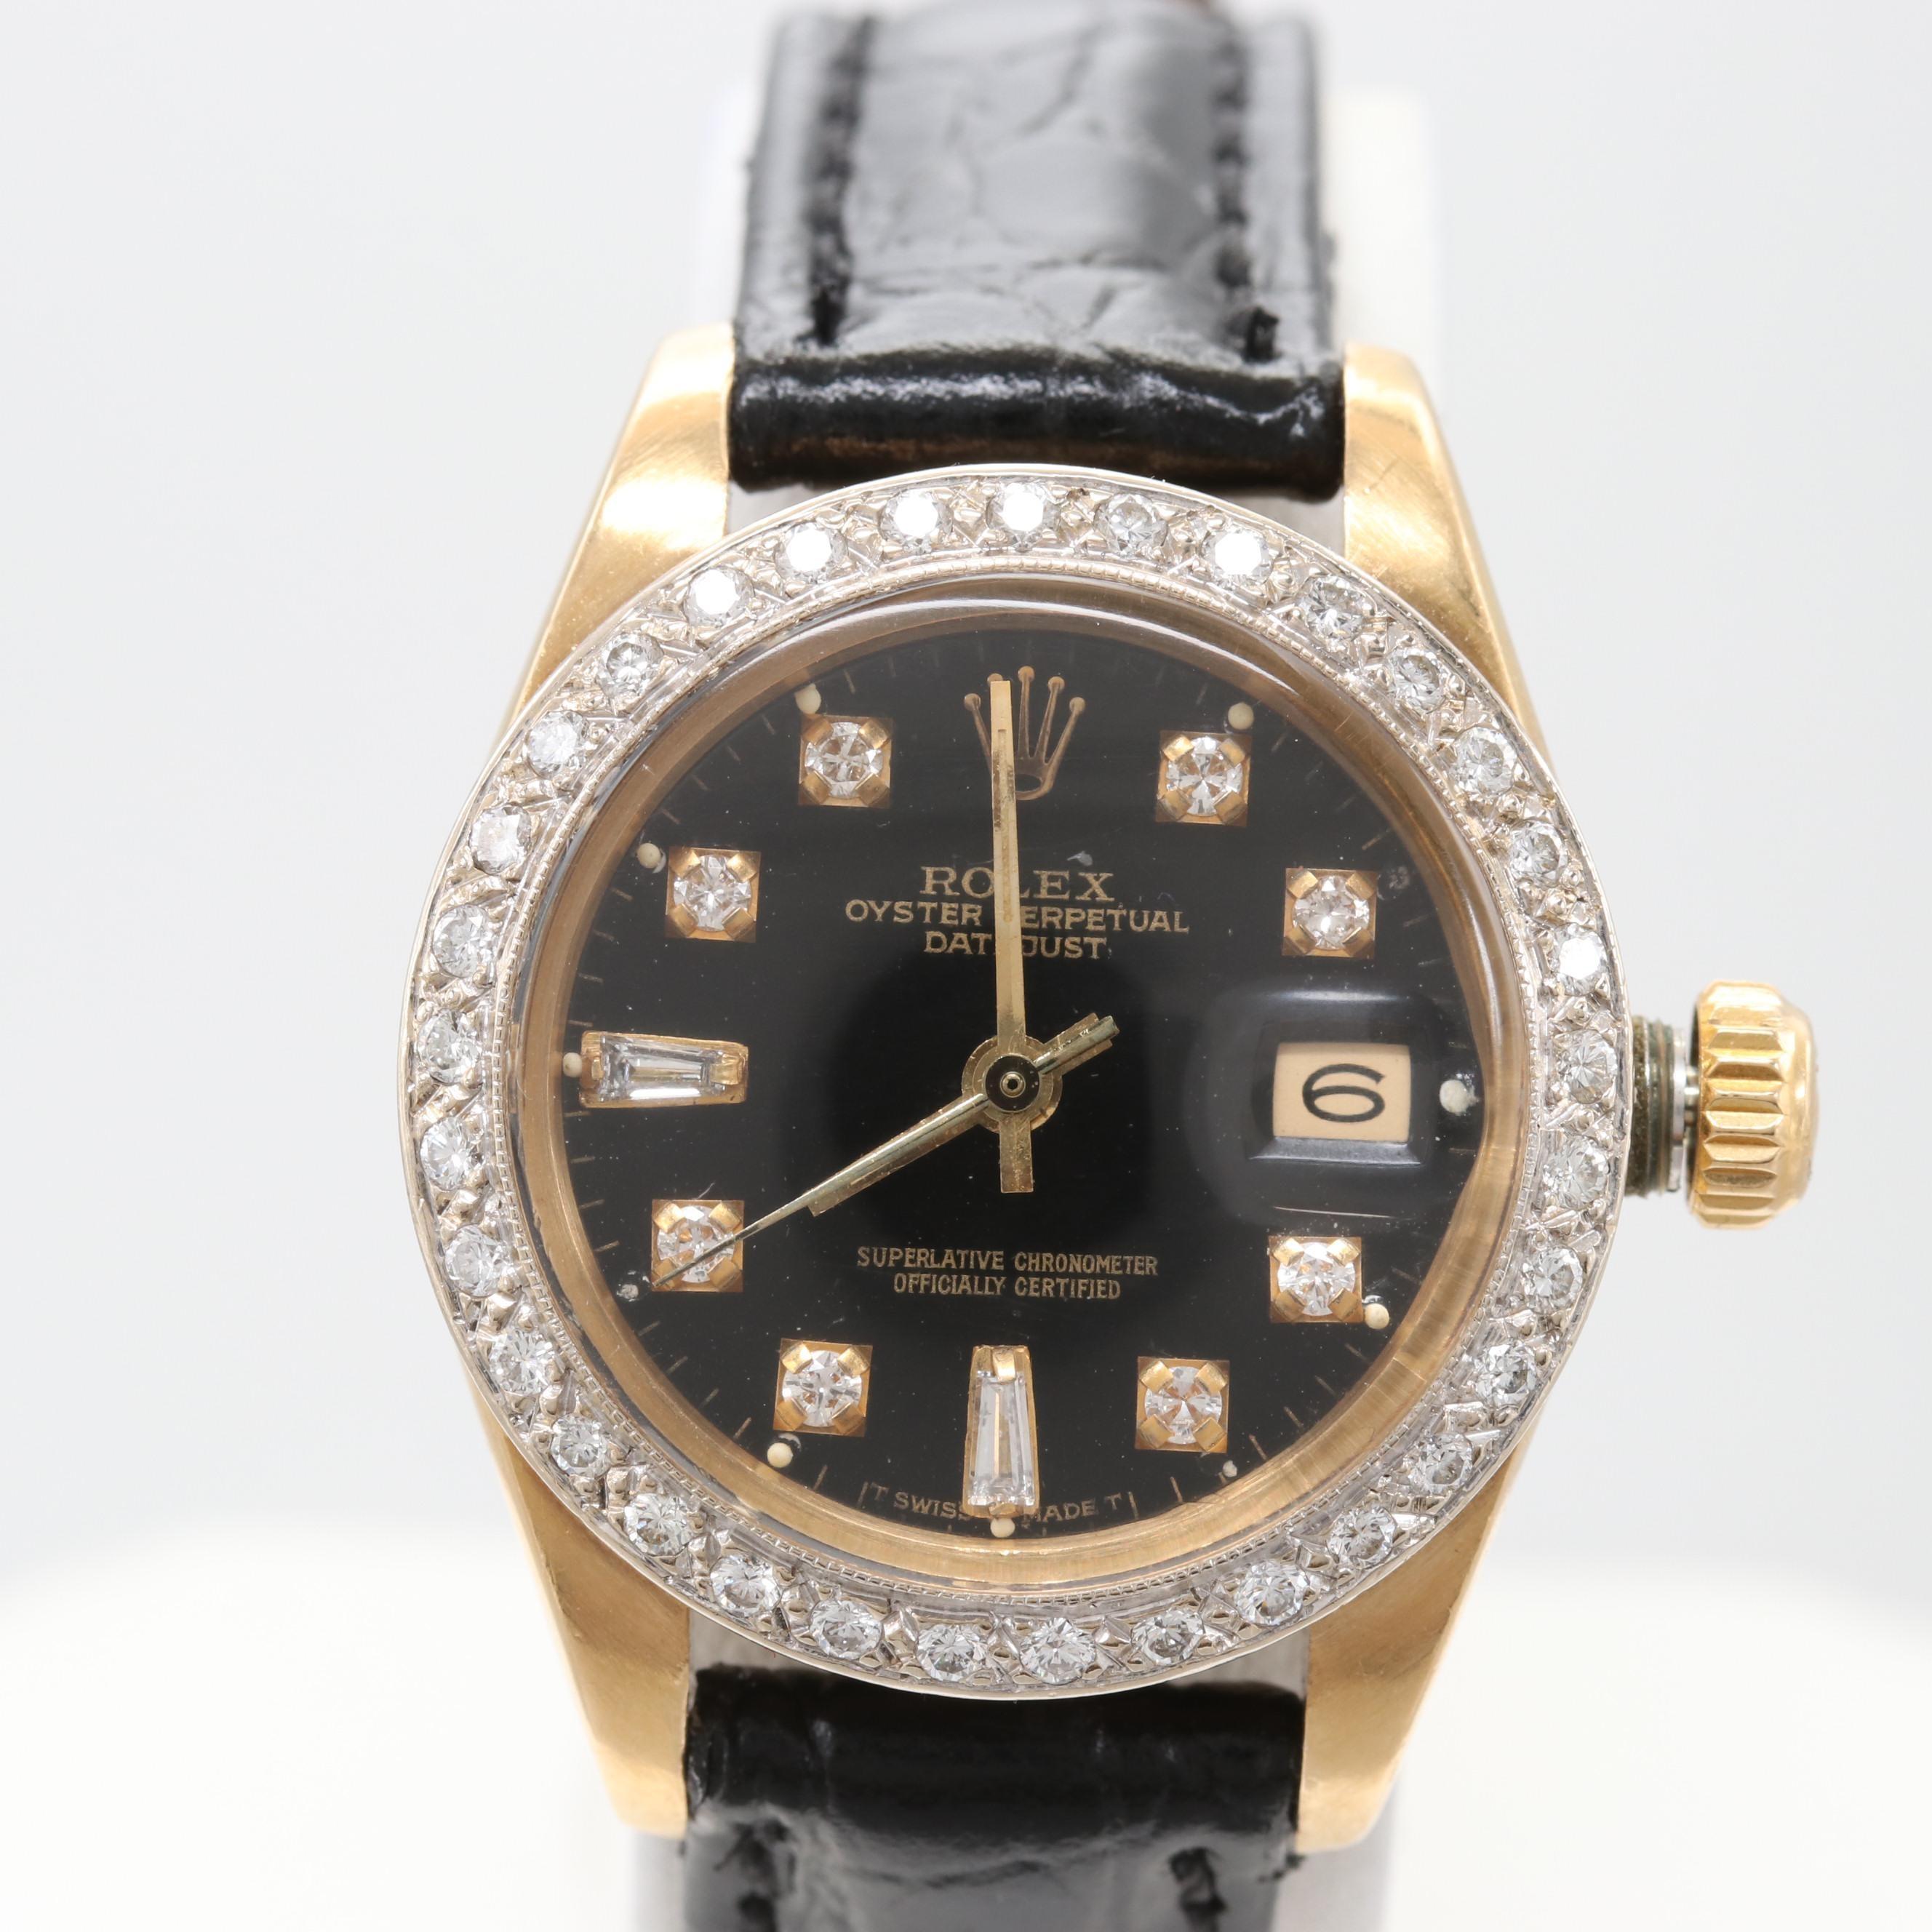 Vintage Rolex Datejust 18K Yellow Gold Diamond Wristwatch, 1983